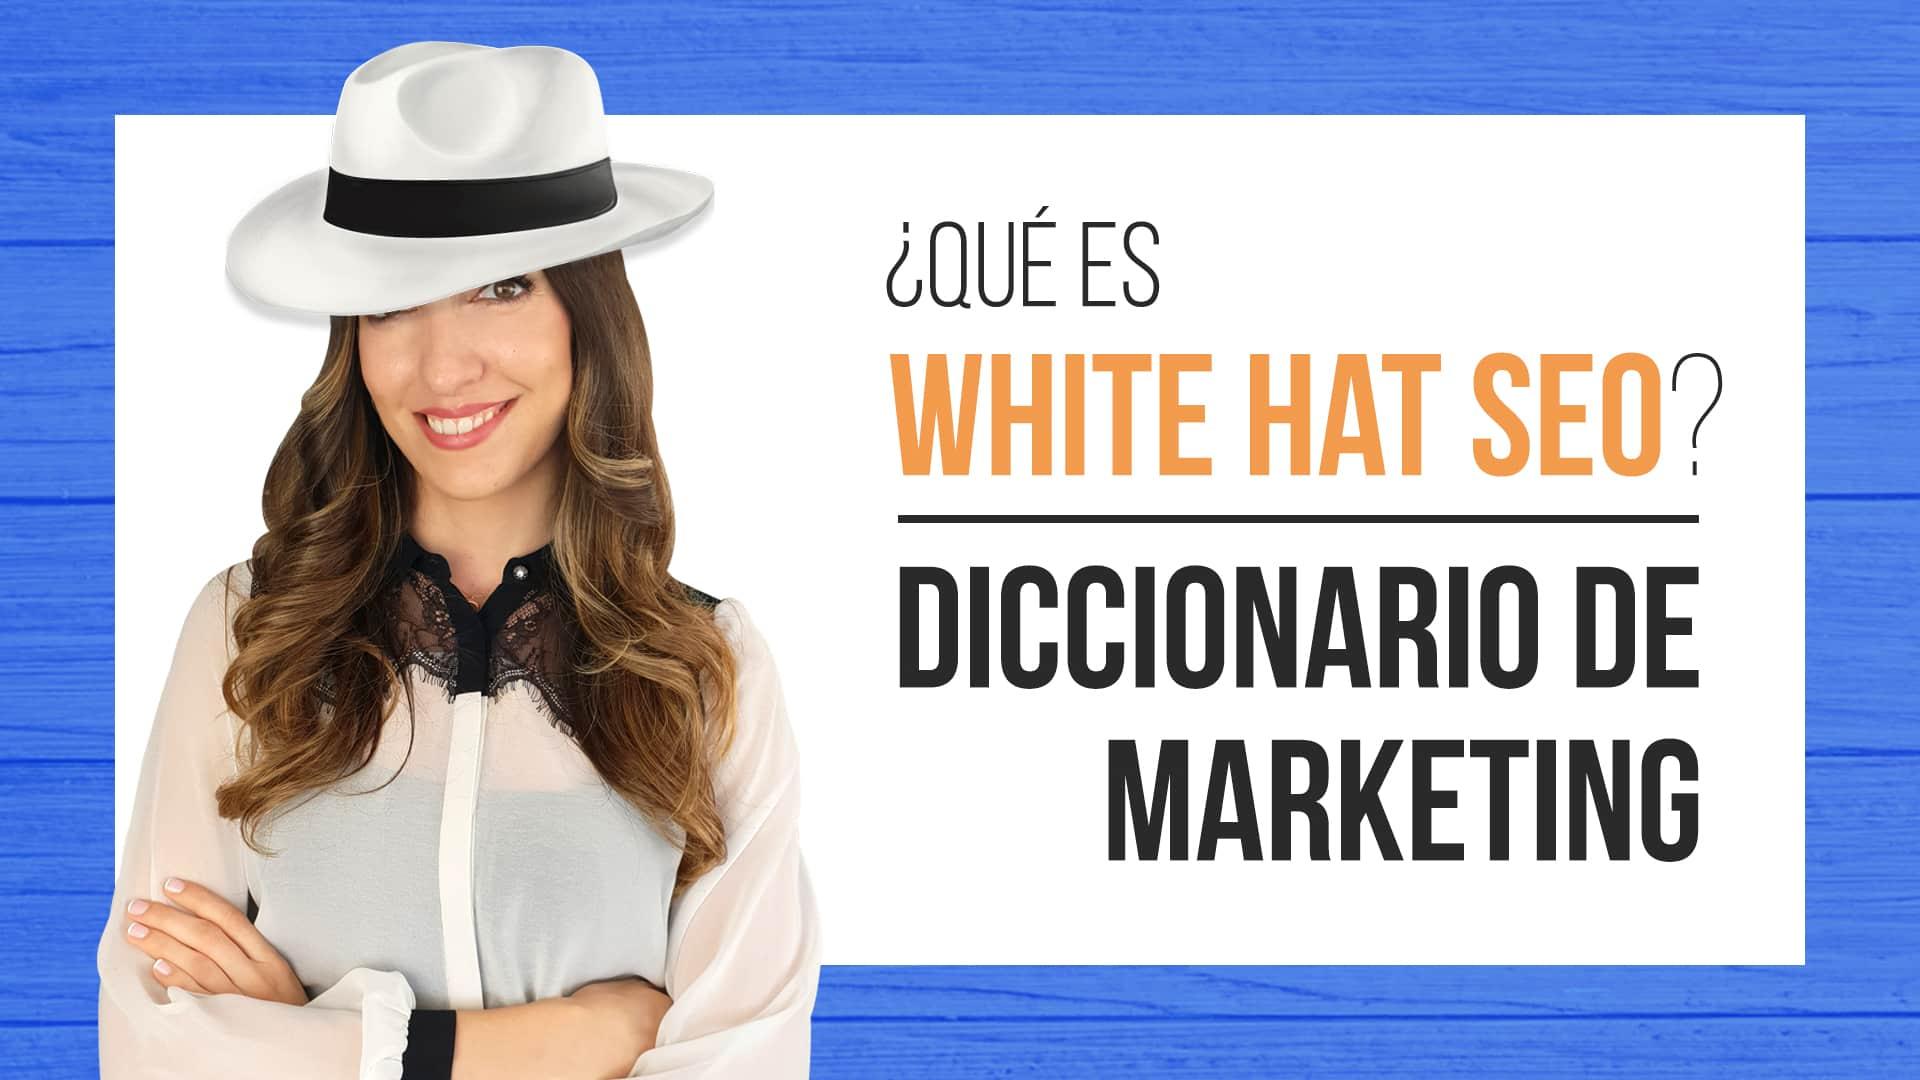 Qué Es White Hat Seo Técnicas Que Debo Usar Para